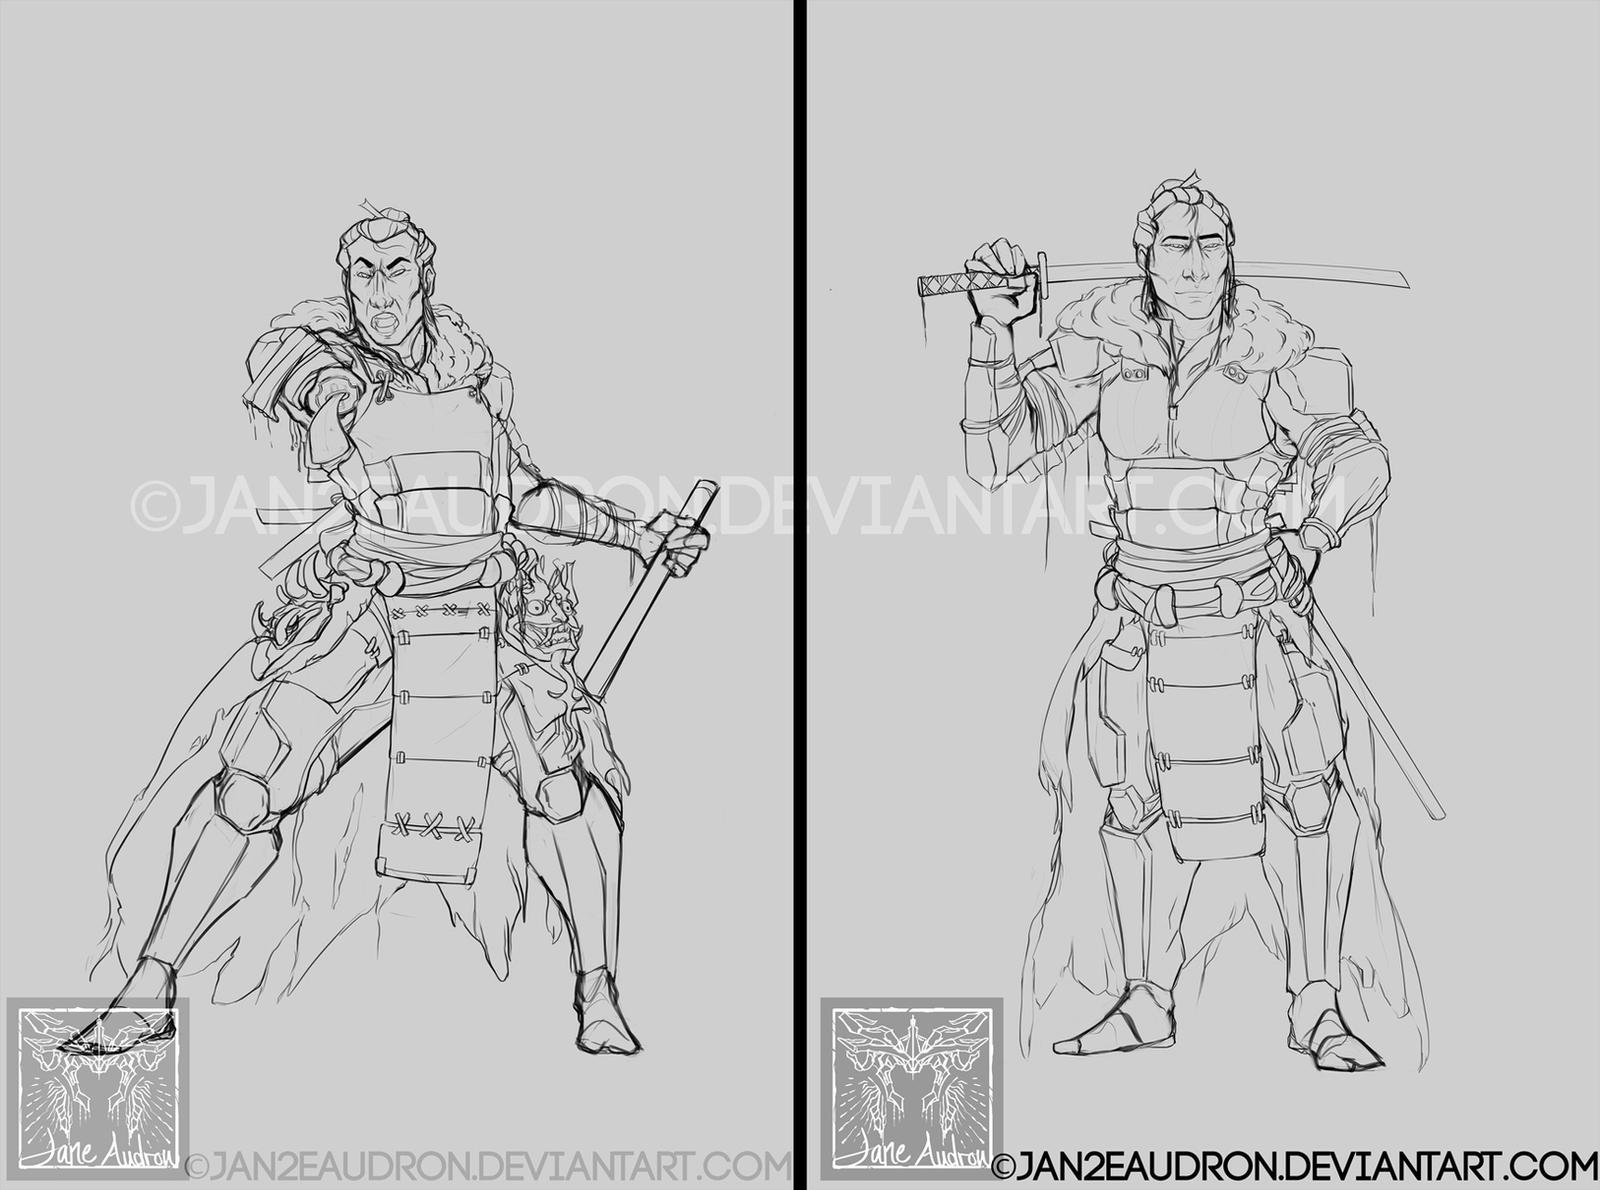 Illust. Proj. 2 - XCOM Samurai Jack(Lines) by Jane2Audron